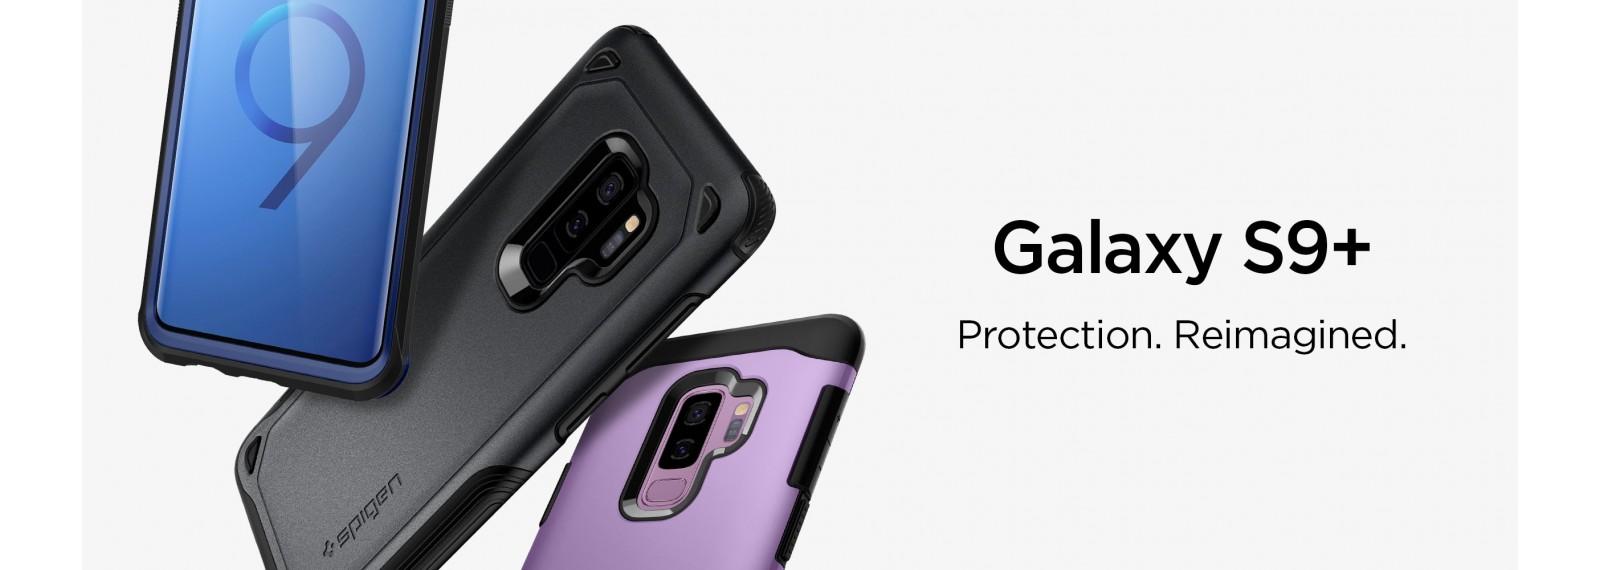 Spigen Malaysia Samsung Galaxy S9 Plus Case